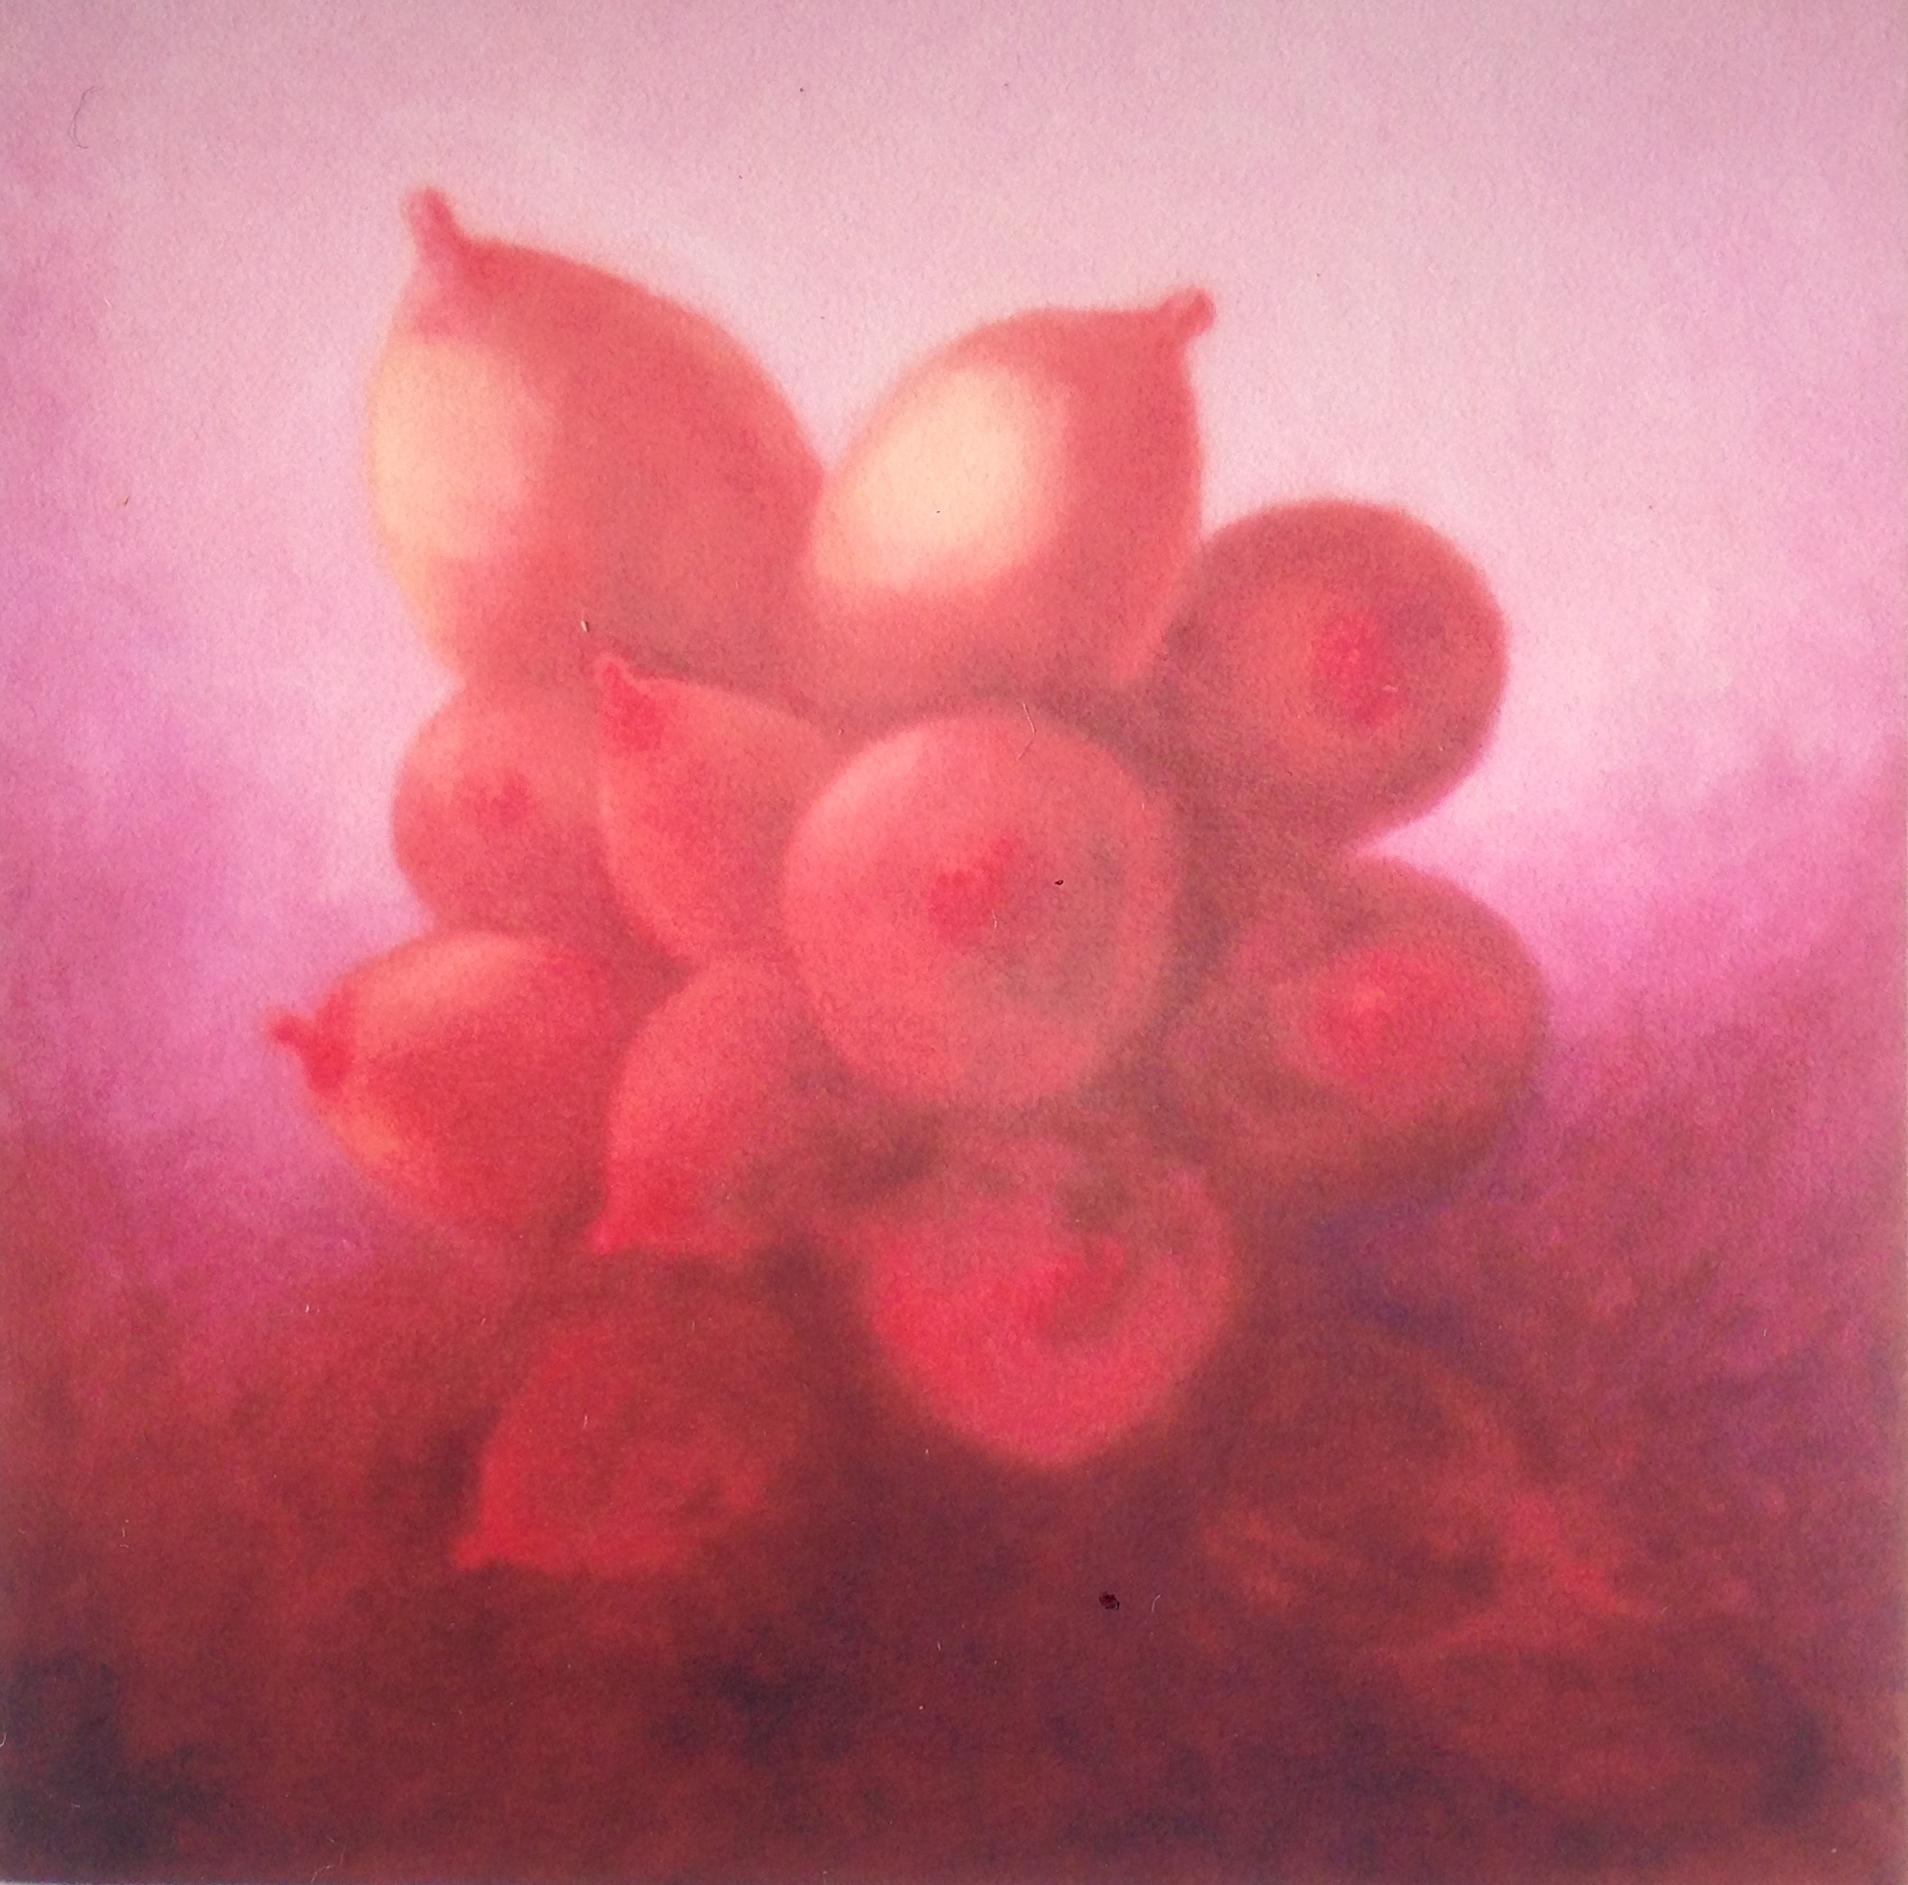 Boob Bouquet, oil on canvas